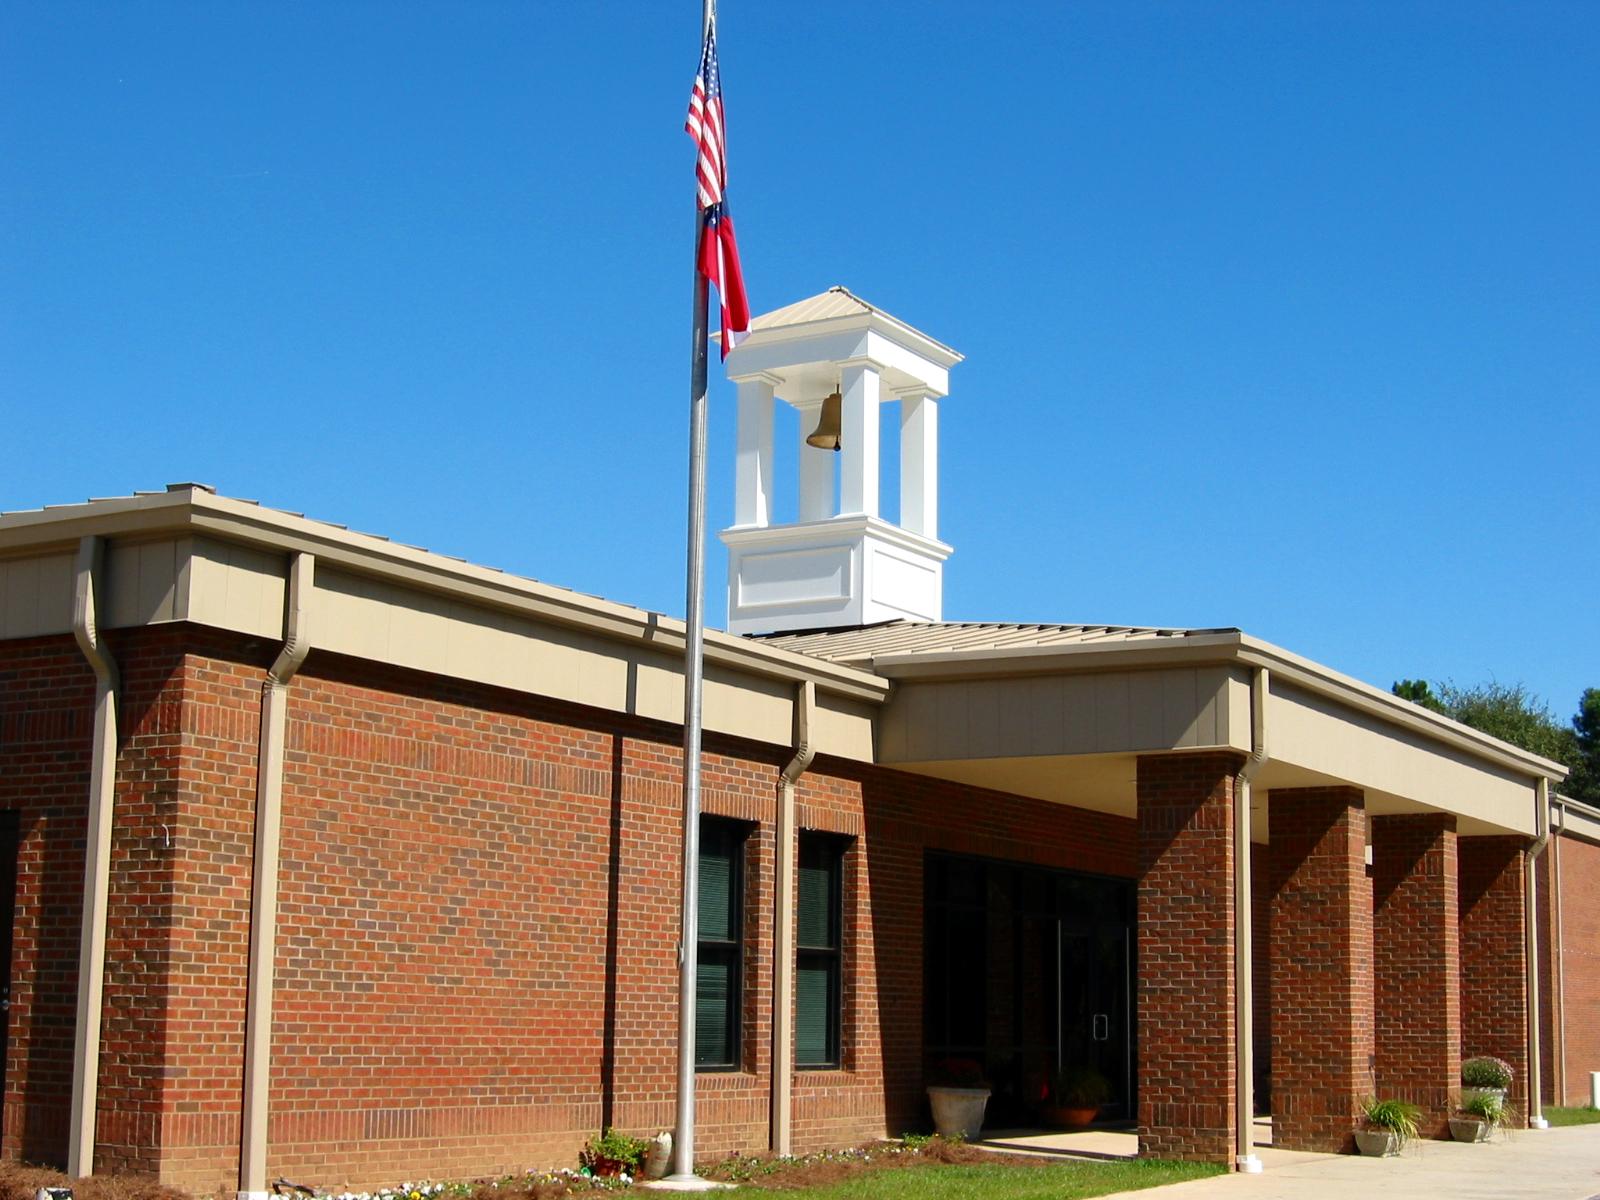 Front Exterior of Building - Cox Elementary School